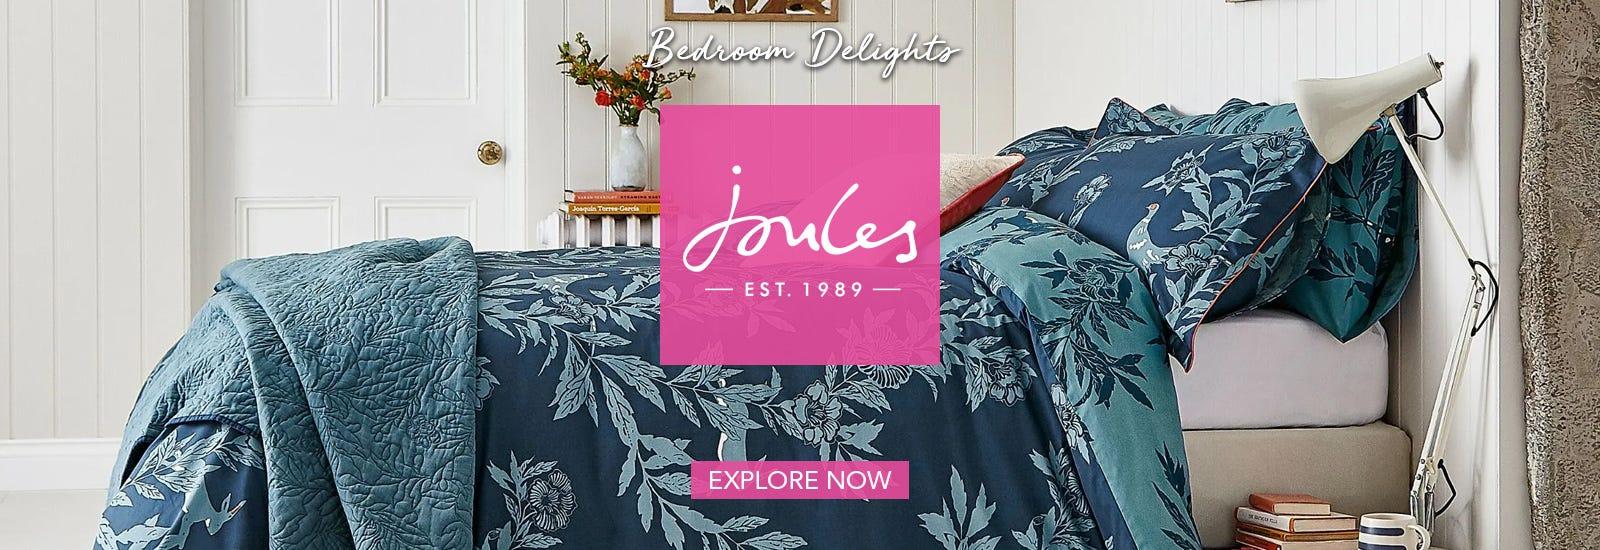 Explore Joules Bedding